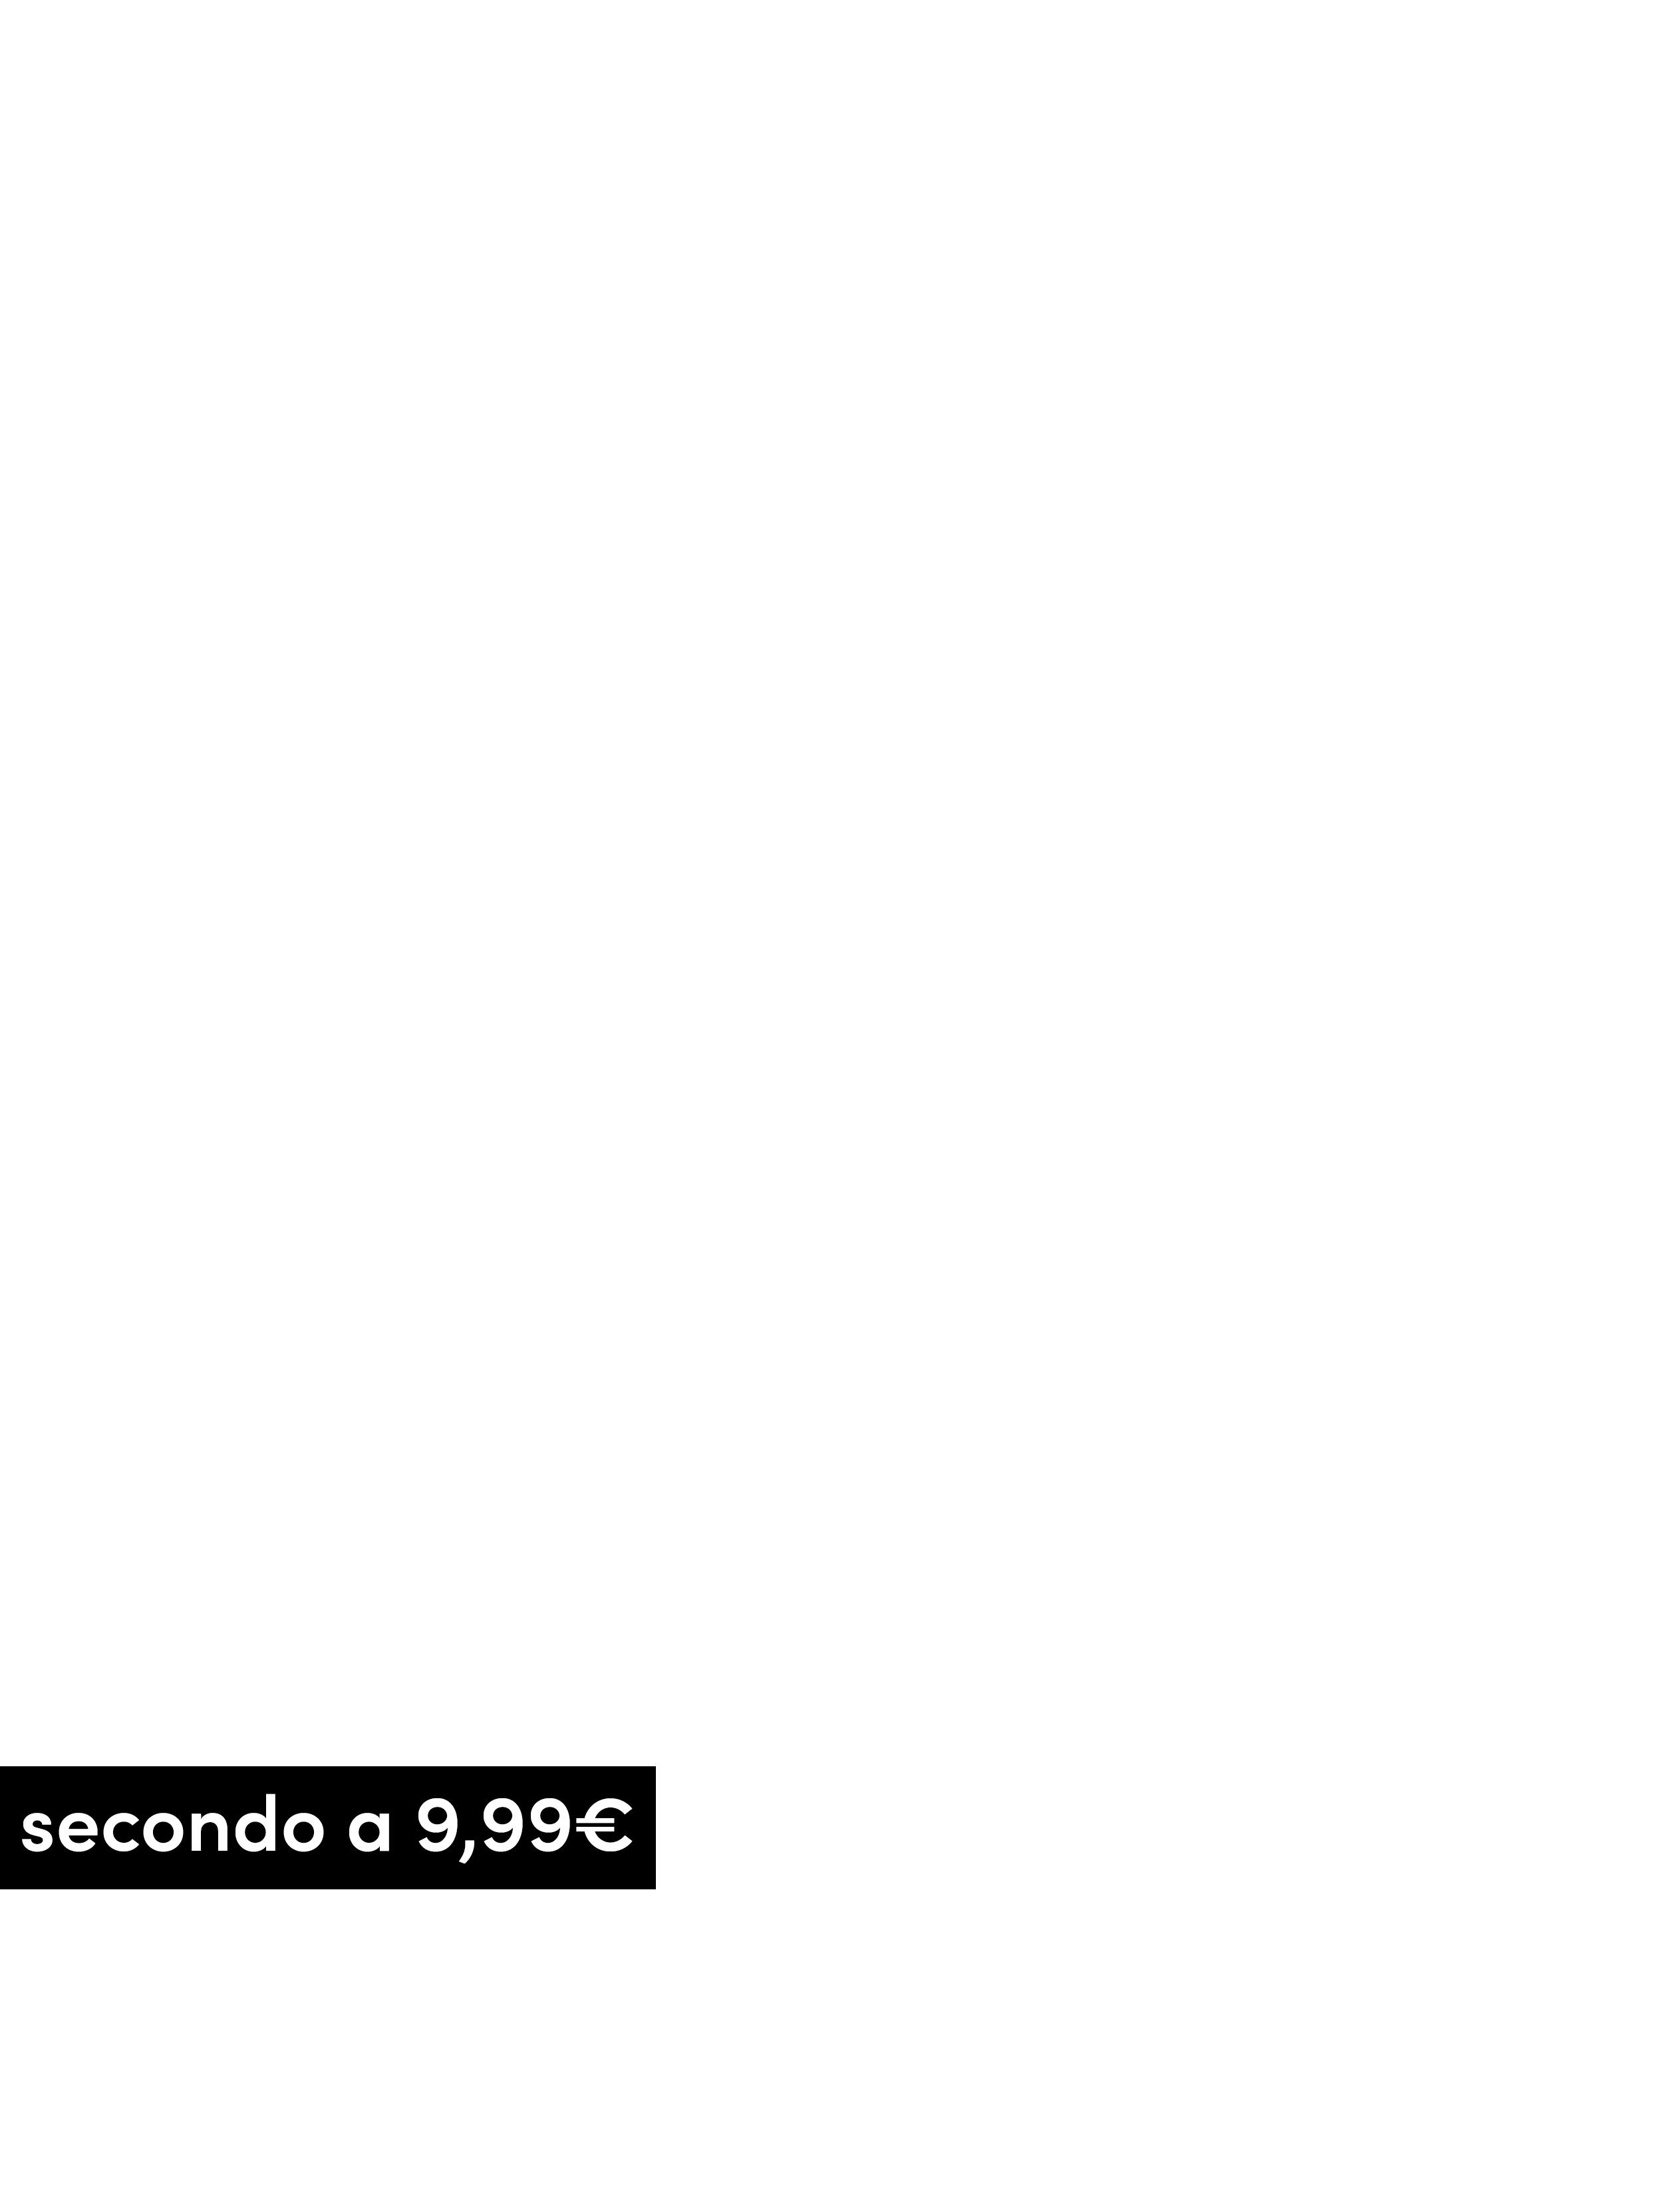 SecondO a 9.99